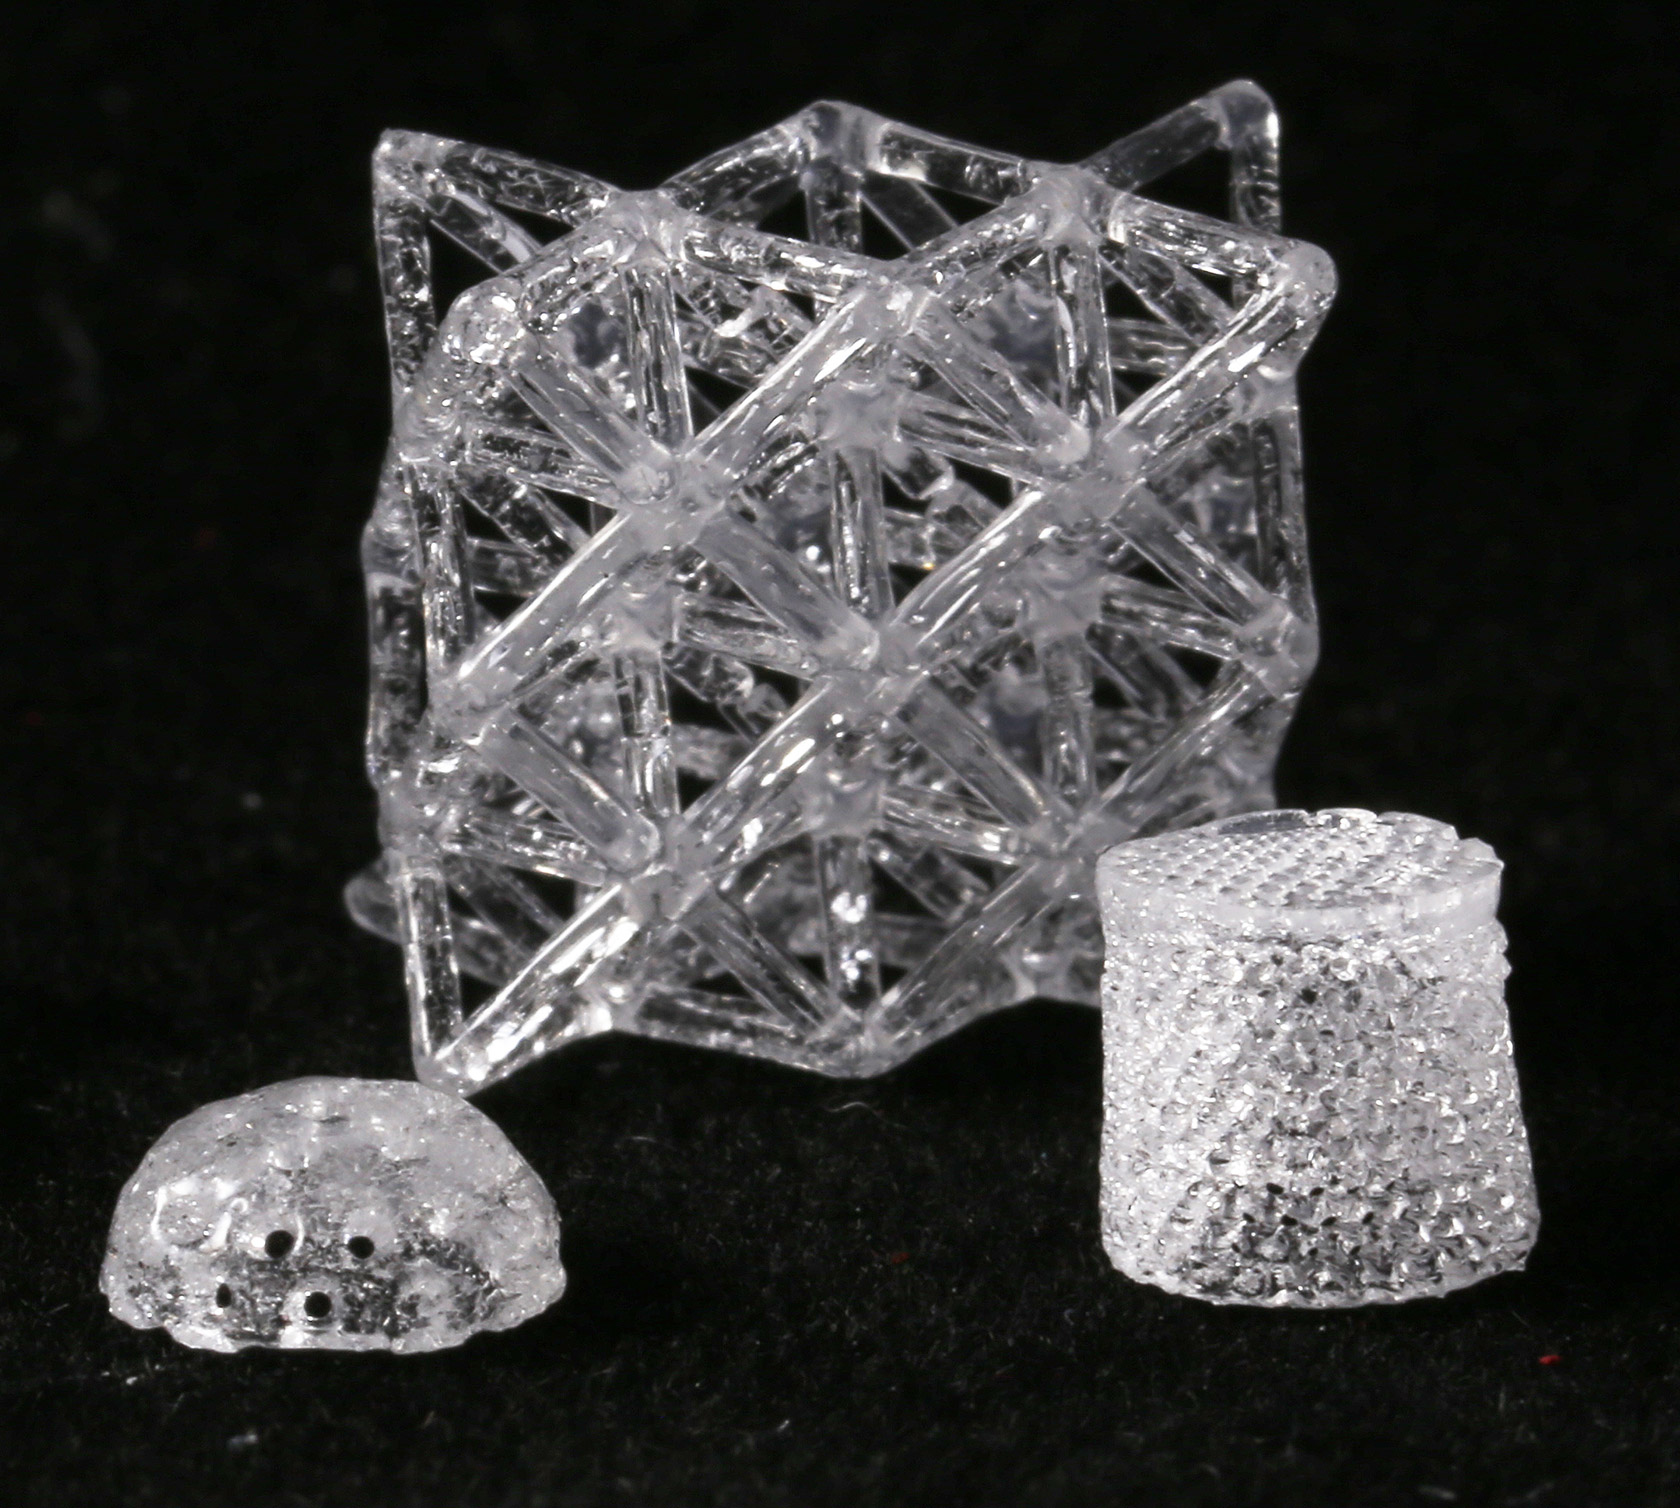 3D Printing Glass Sculpture